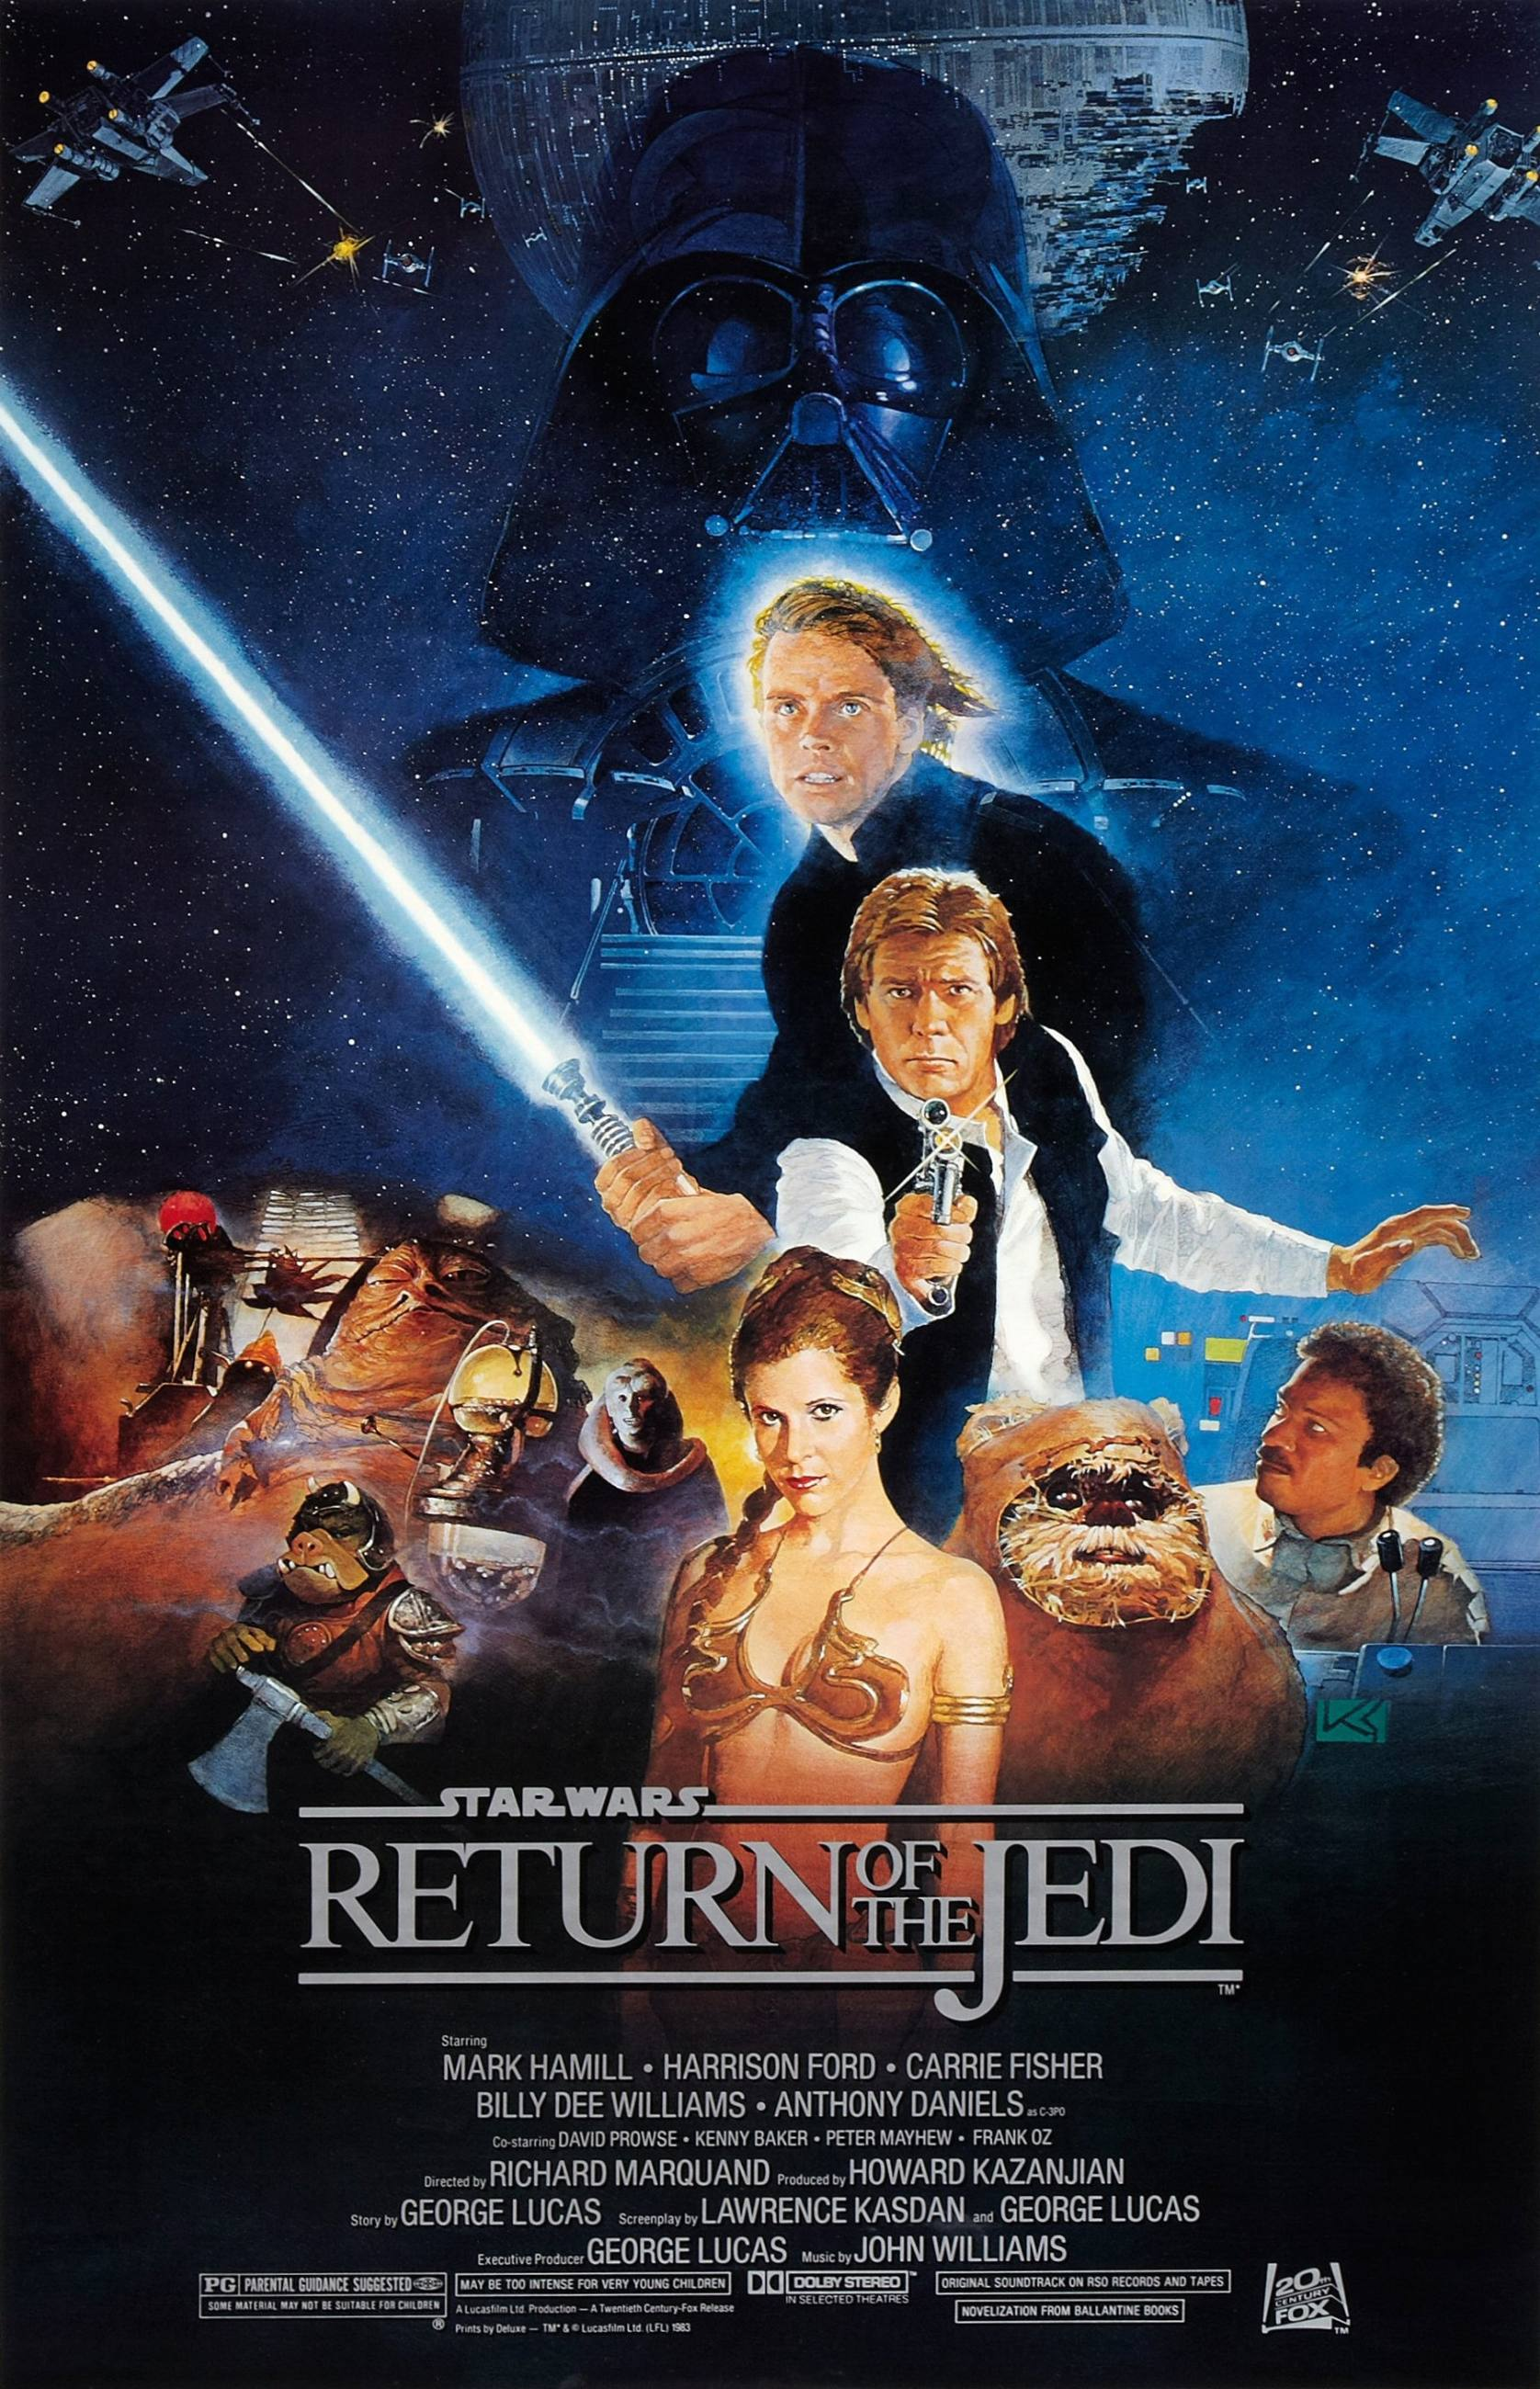 """Star Wars: Episode VI - Return of the Jedi"" movie poster"